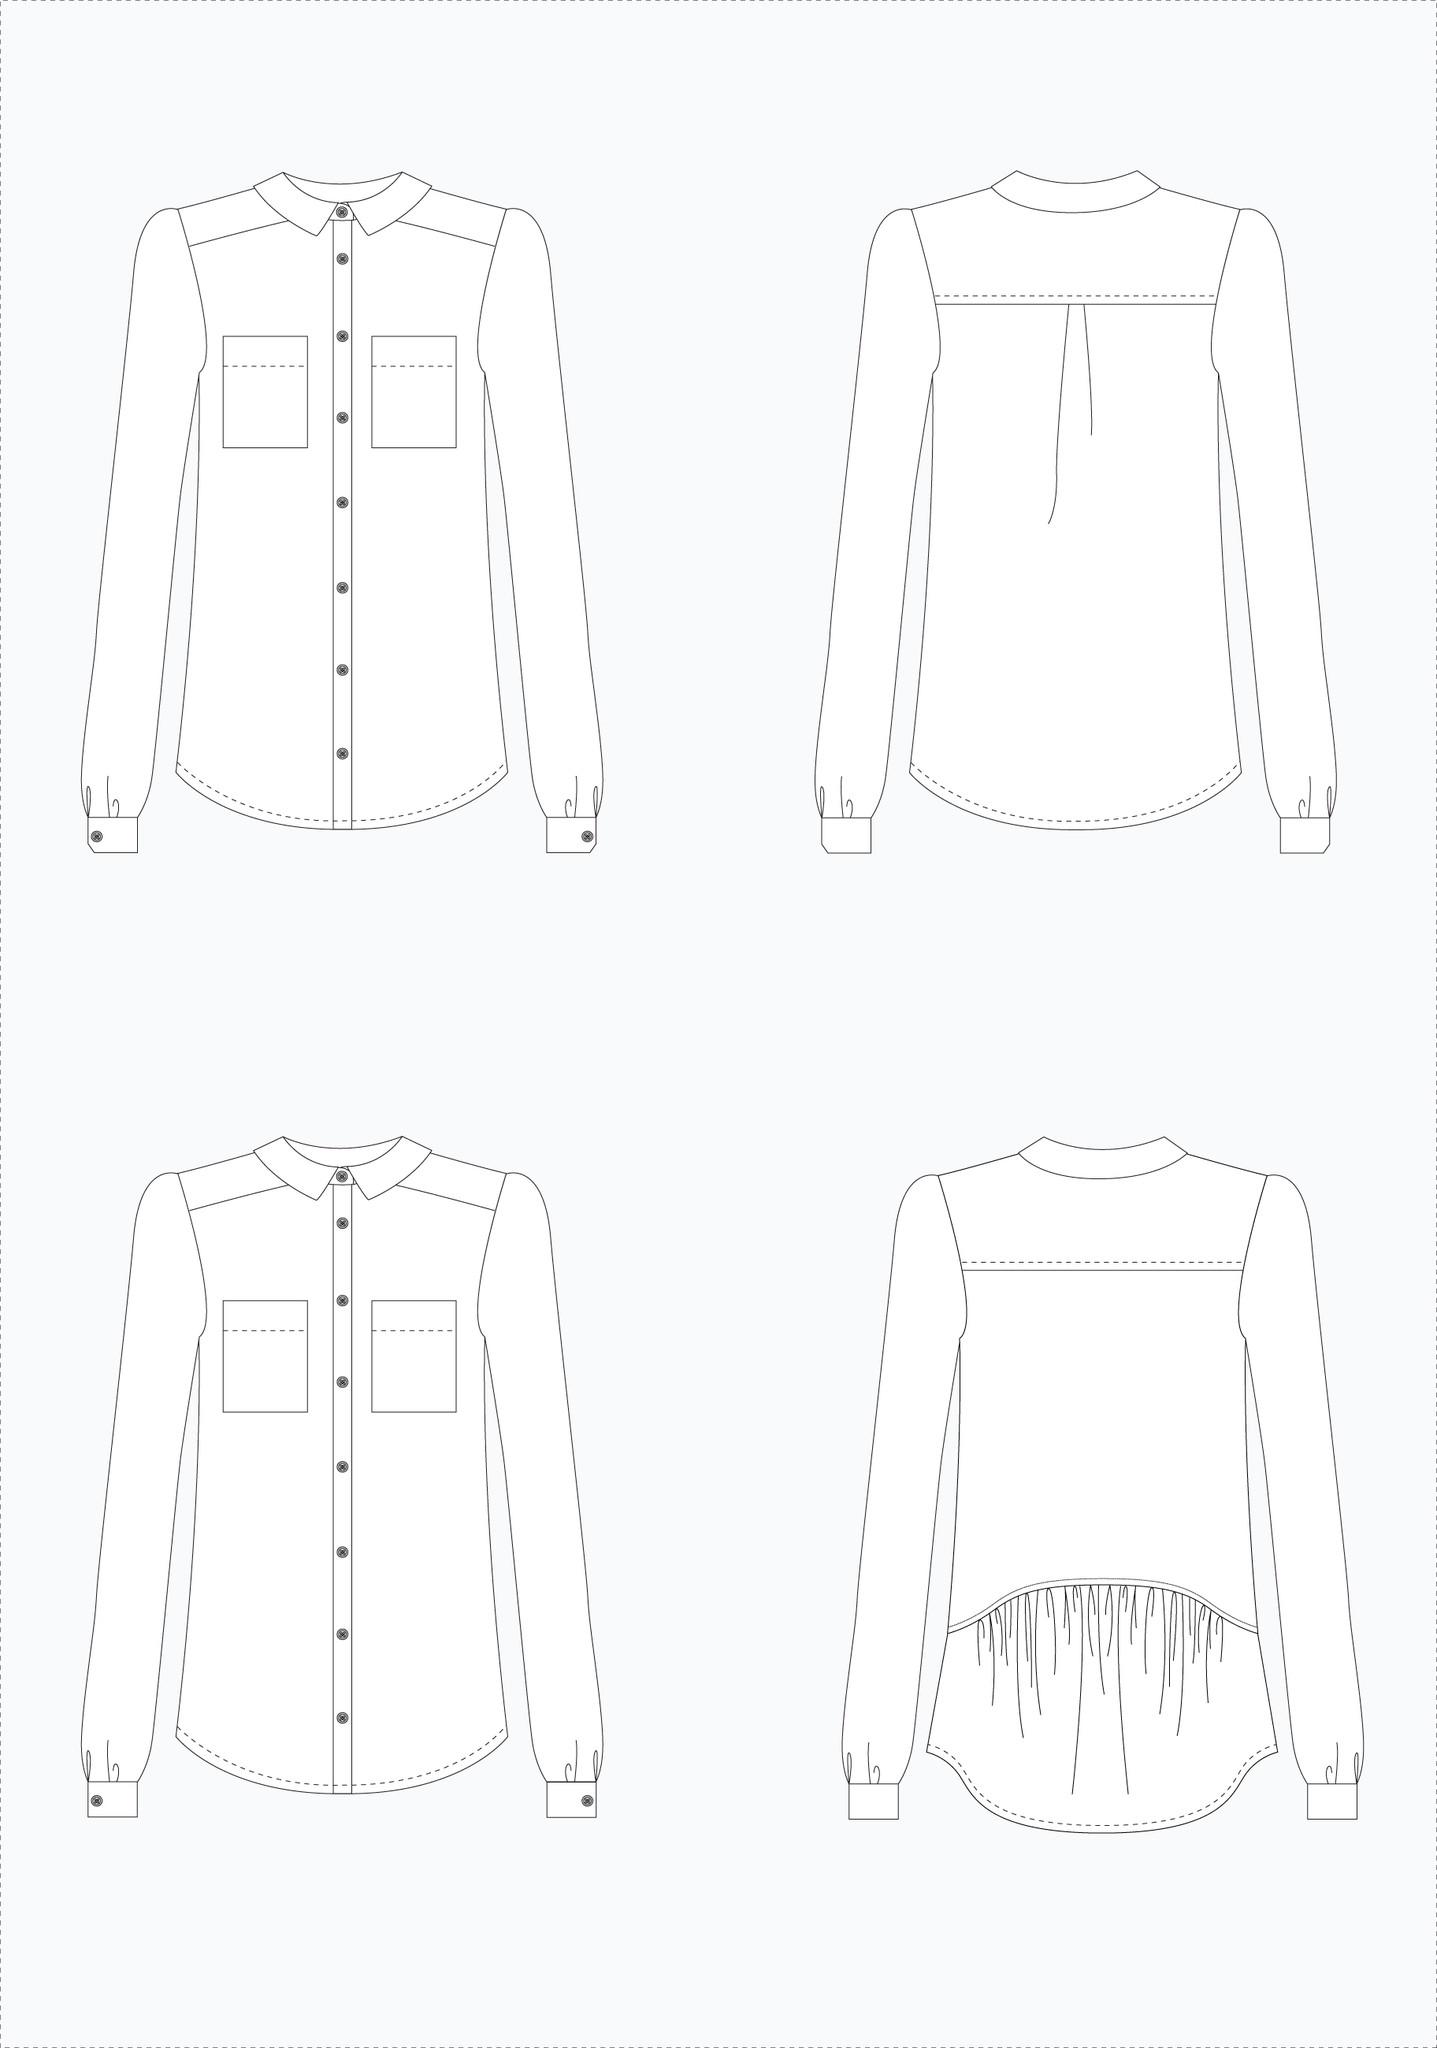 Holm Sown; Grainline Studio Archer Shirt Sewing Pattern